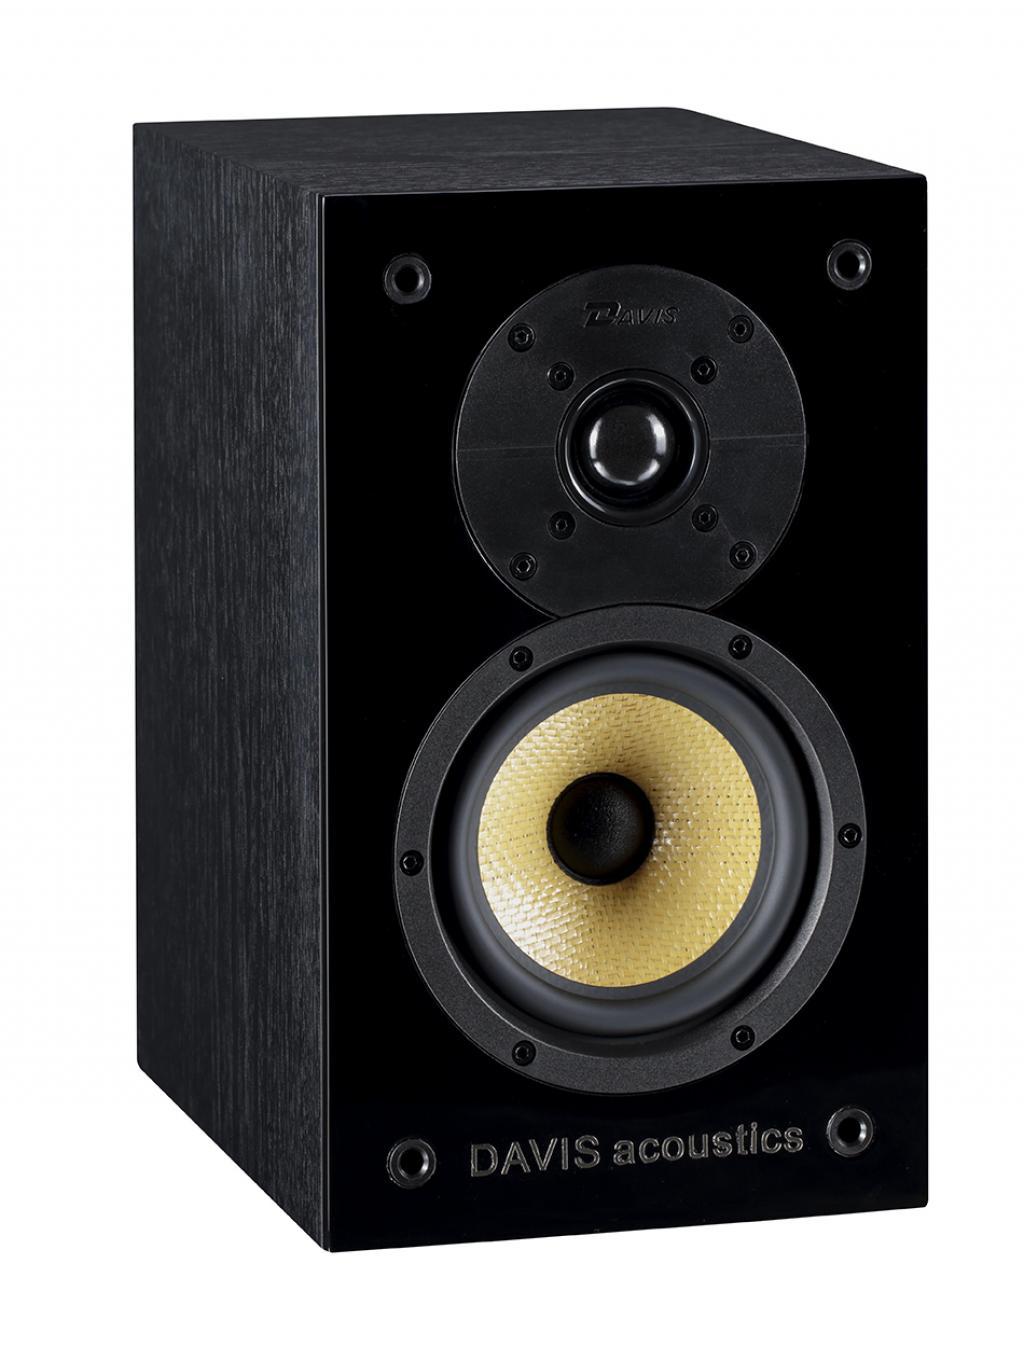 Boxe Davis Acoustics Balthus 30 White